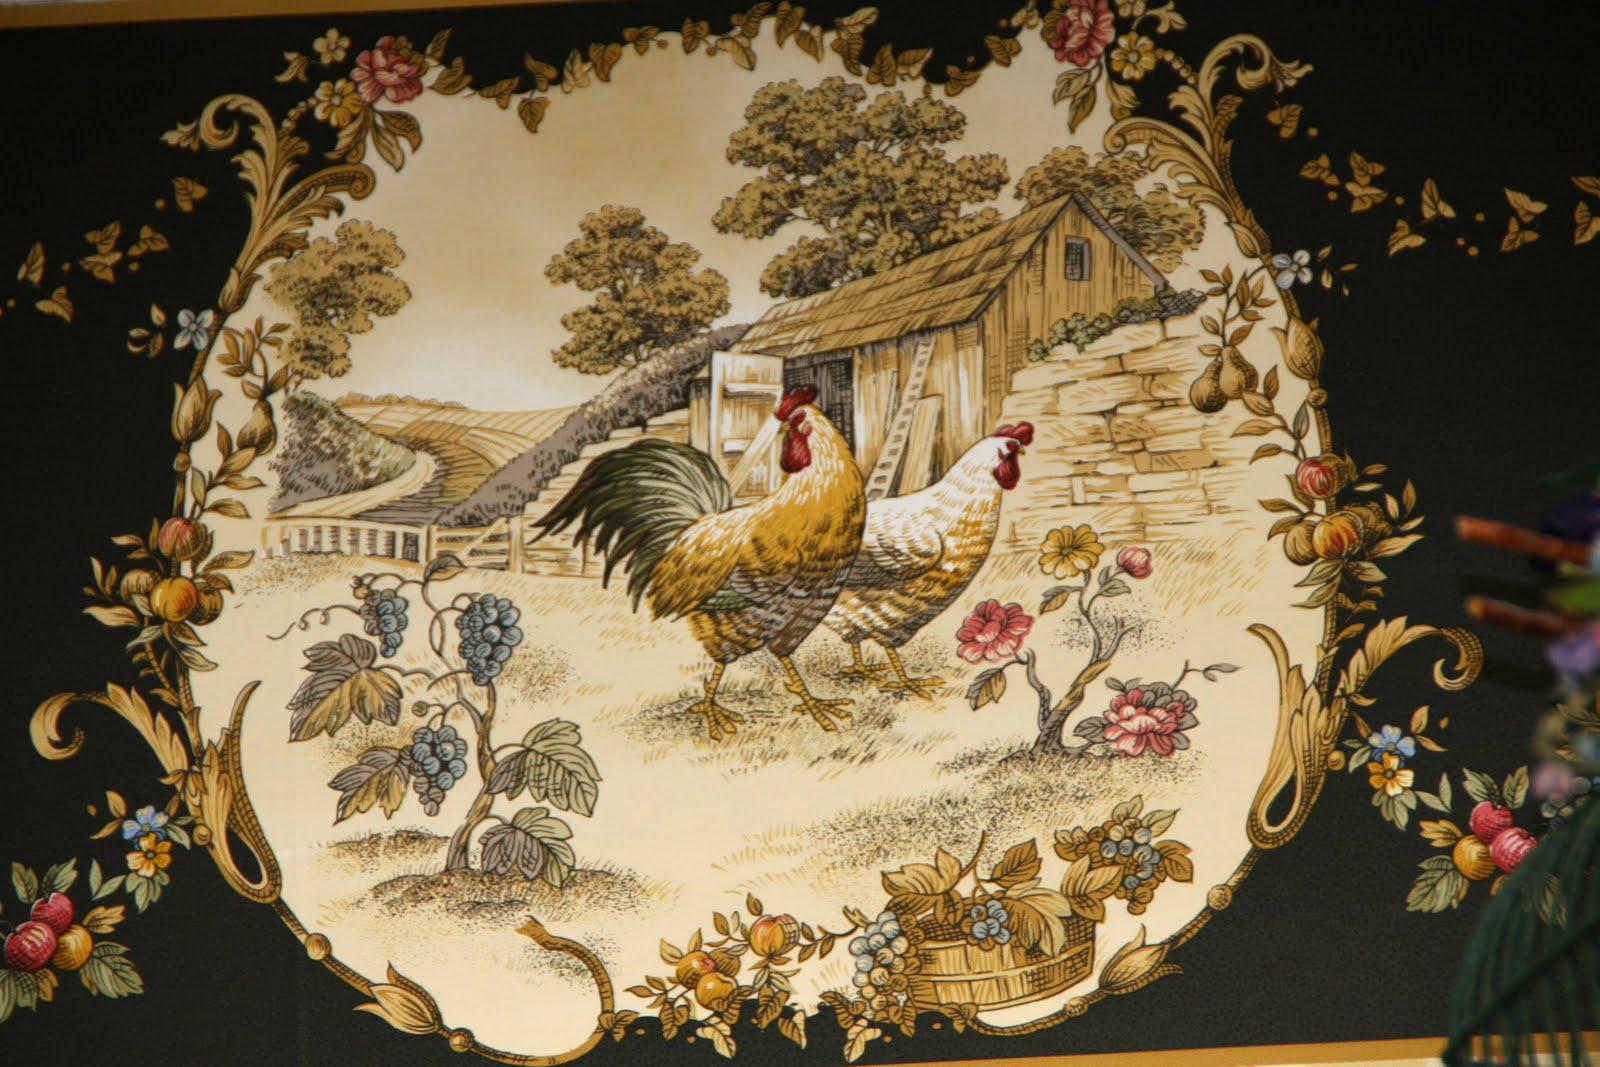 kitchen wallpaper and borders 2017 - Grasscloth Wallpaper